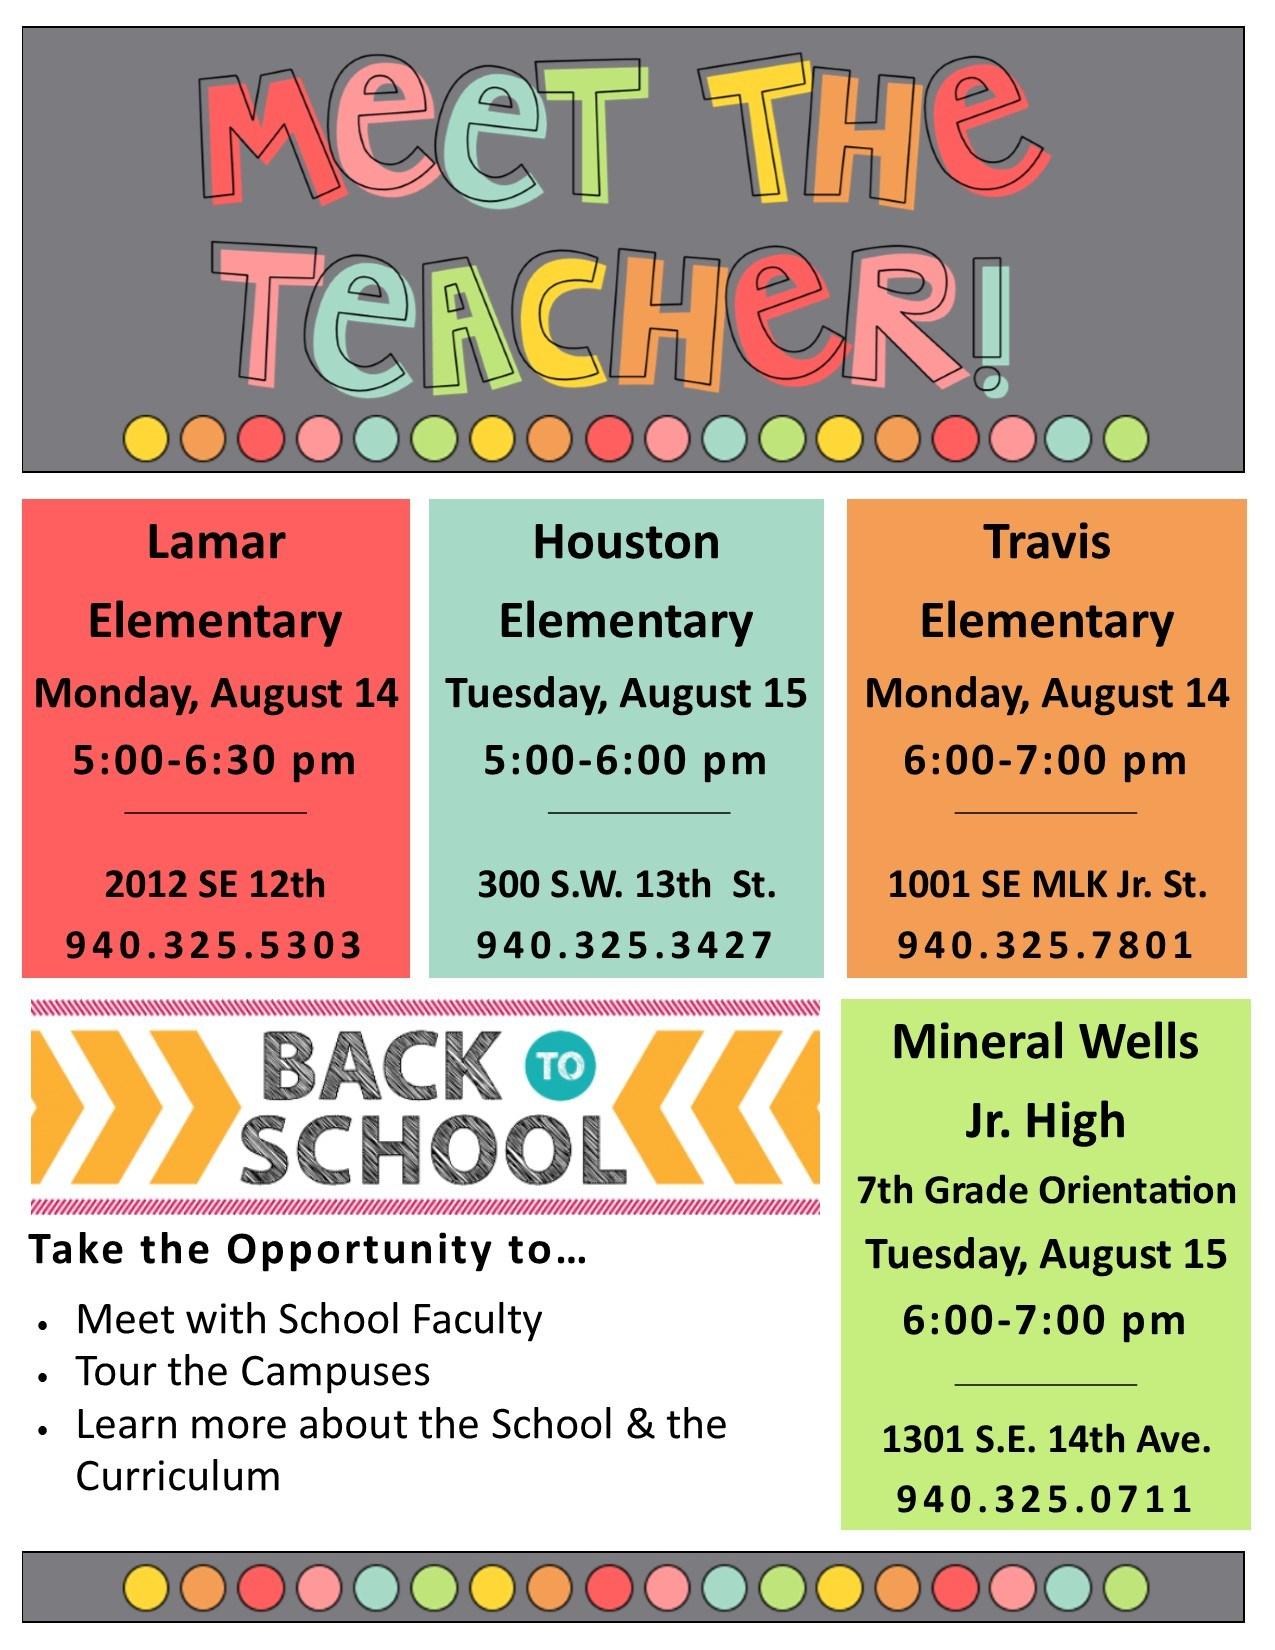 2017 Meet the Teacher Dates at Mineral Wells ISD